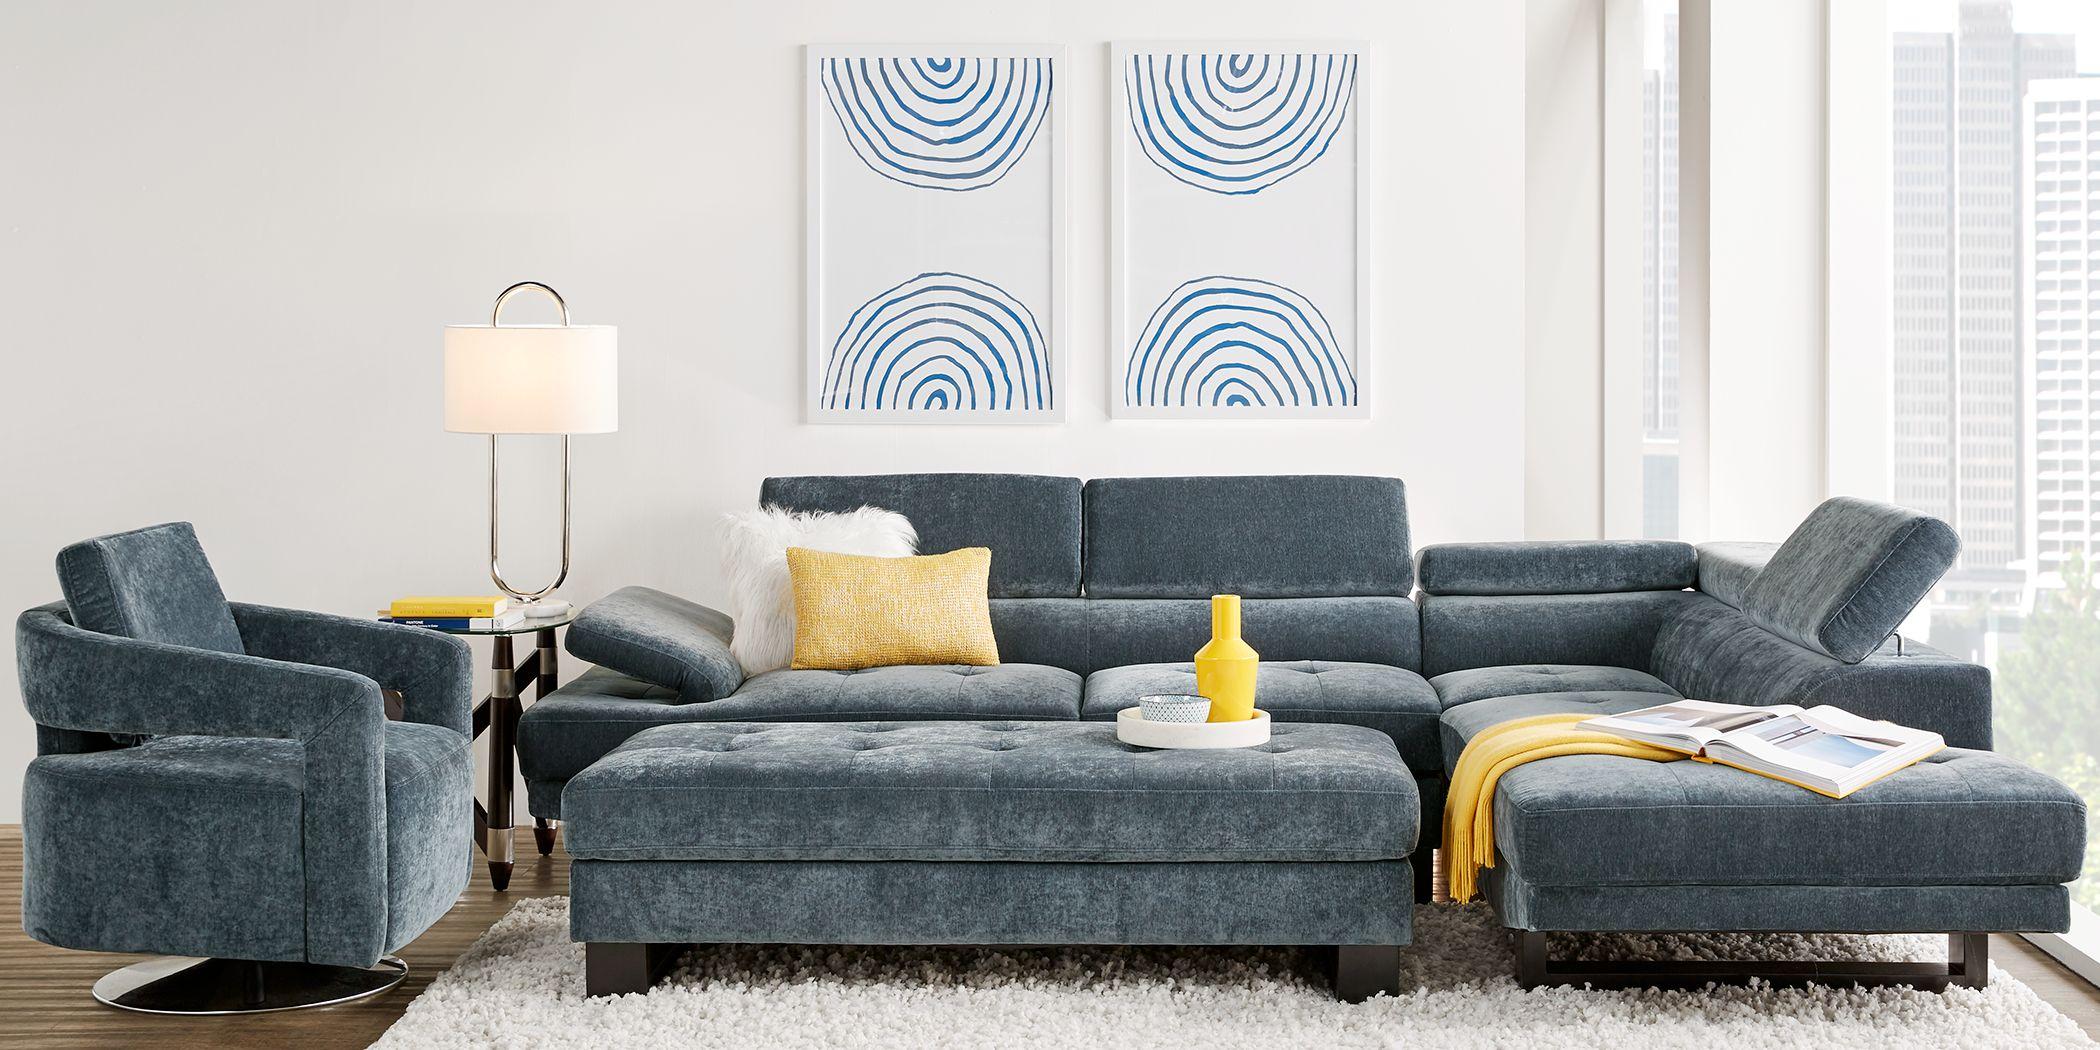 Northside Ocean 3 Pc Sectional Living Room